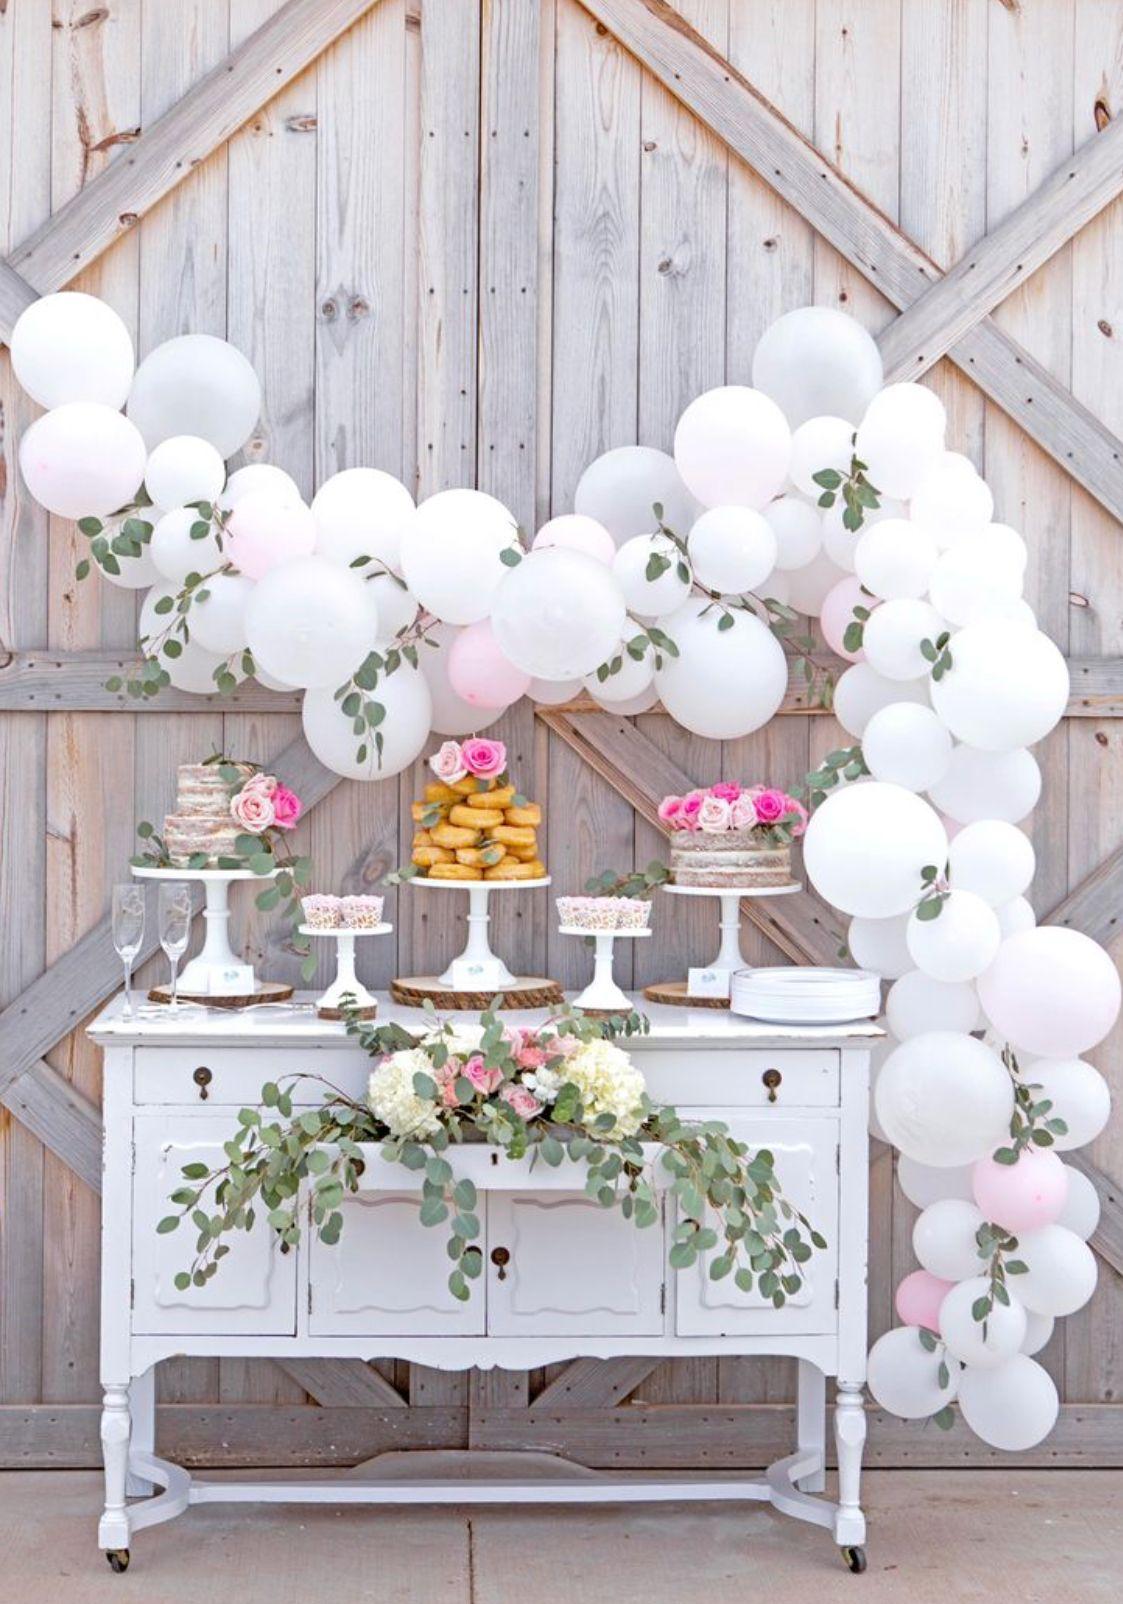 Kids Birthday Party Decor Ideas | Kids Birthday Party | Pinterest ...